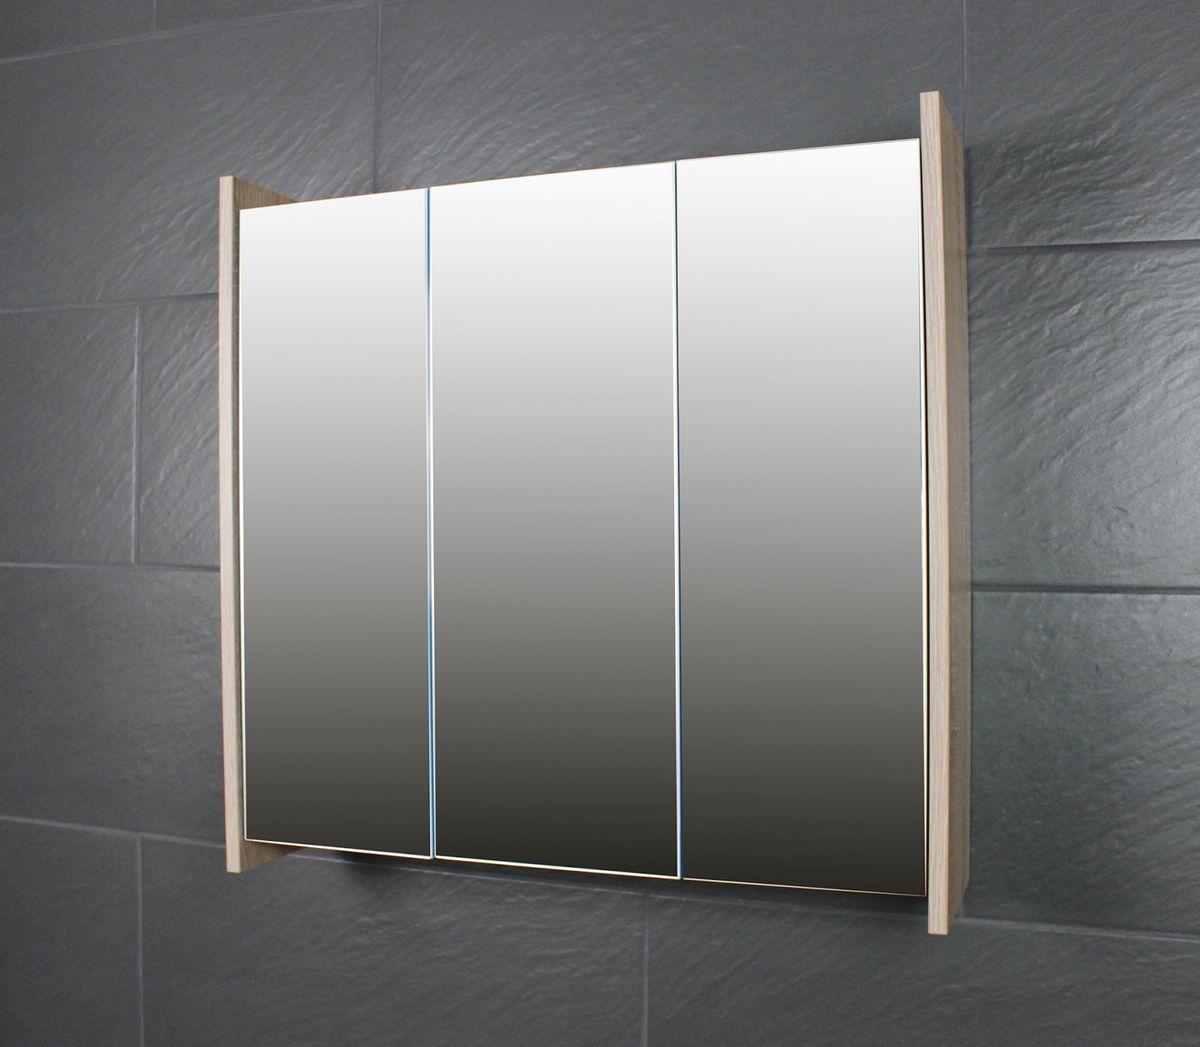 galdem frosti spiegelschrank 70cm spiegel. Black Bedroom Furniture Sets. Home Design Ideas